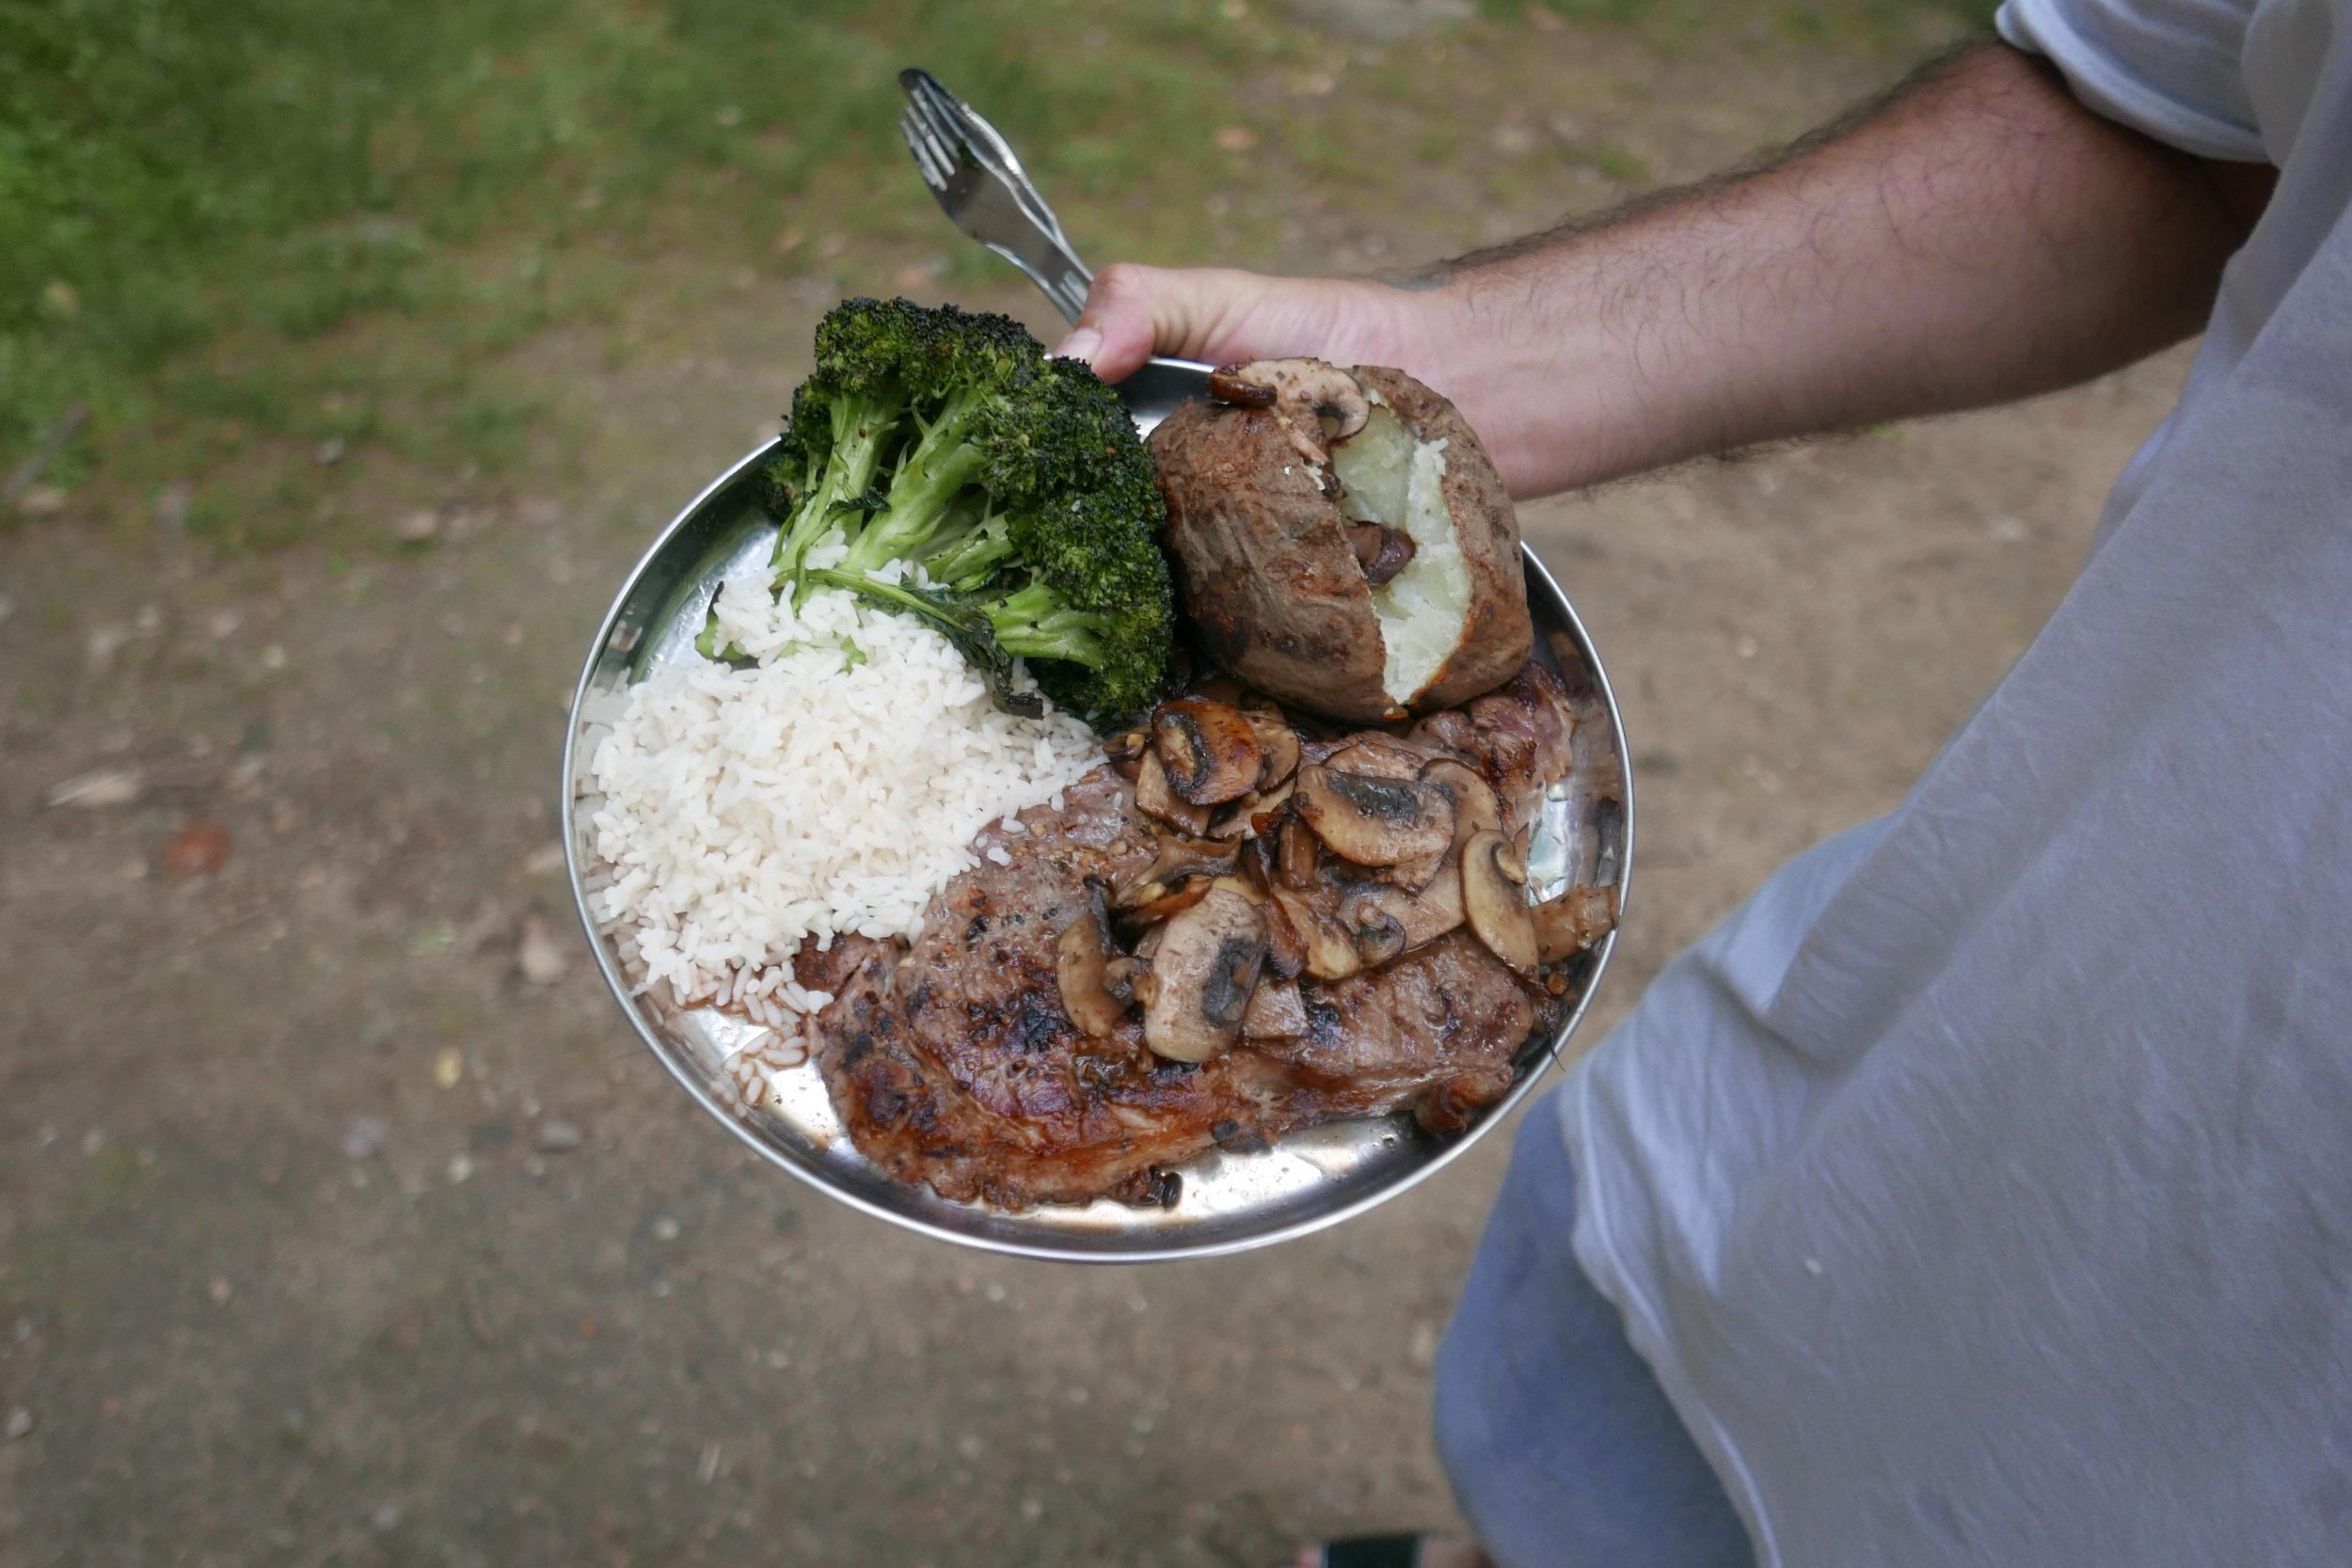 Meal of Miiggy